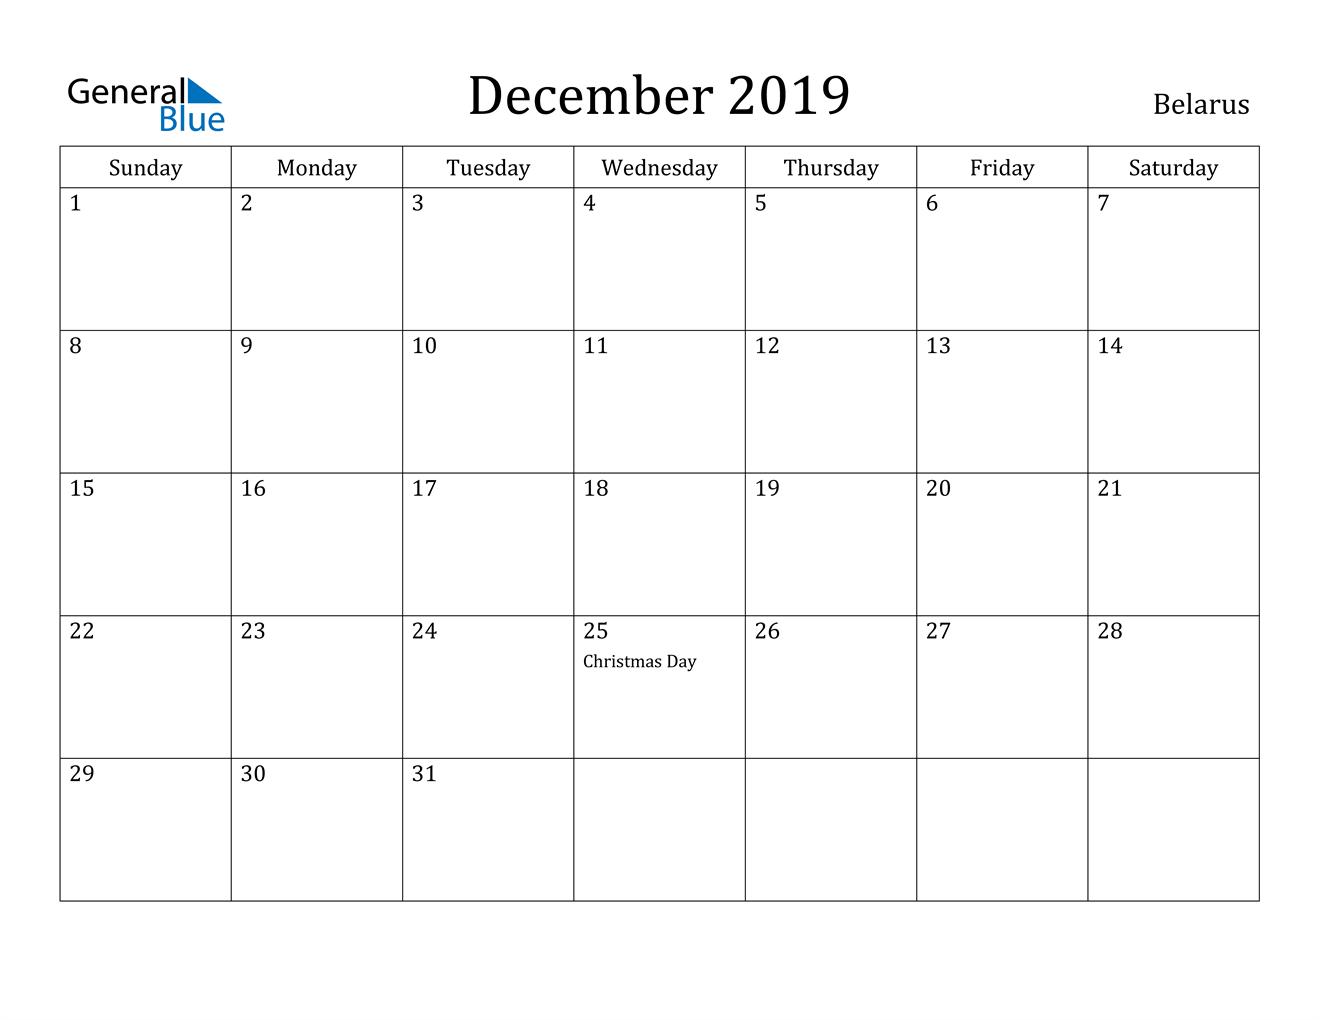 Image of December 2019 Belarus Calendar with Holidays Calendar